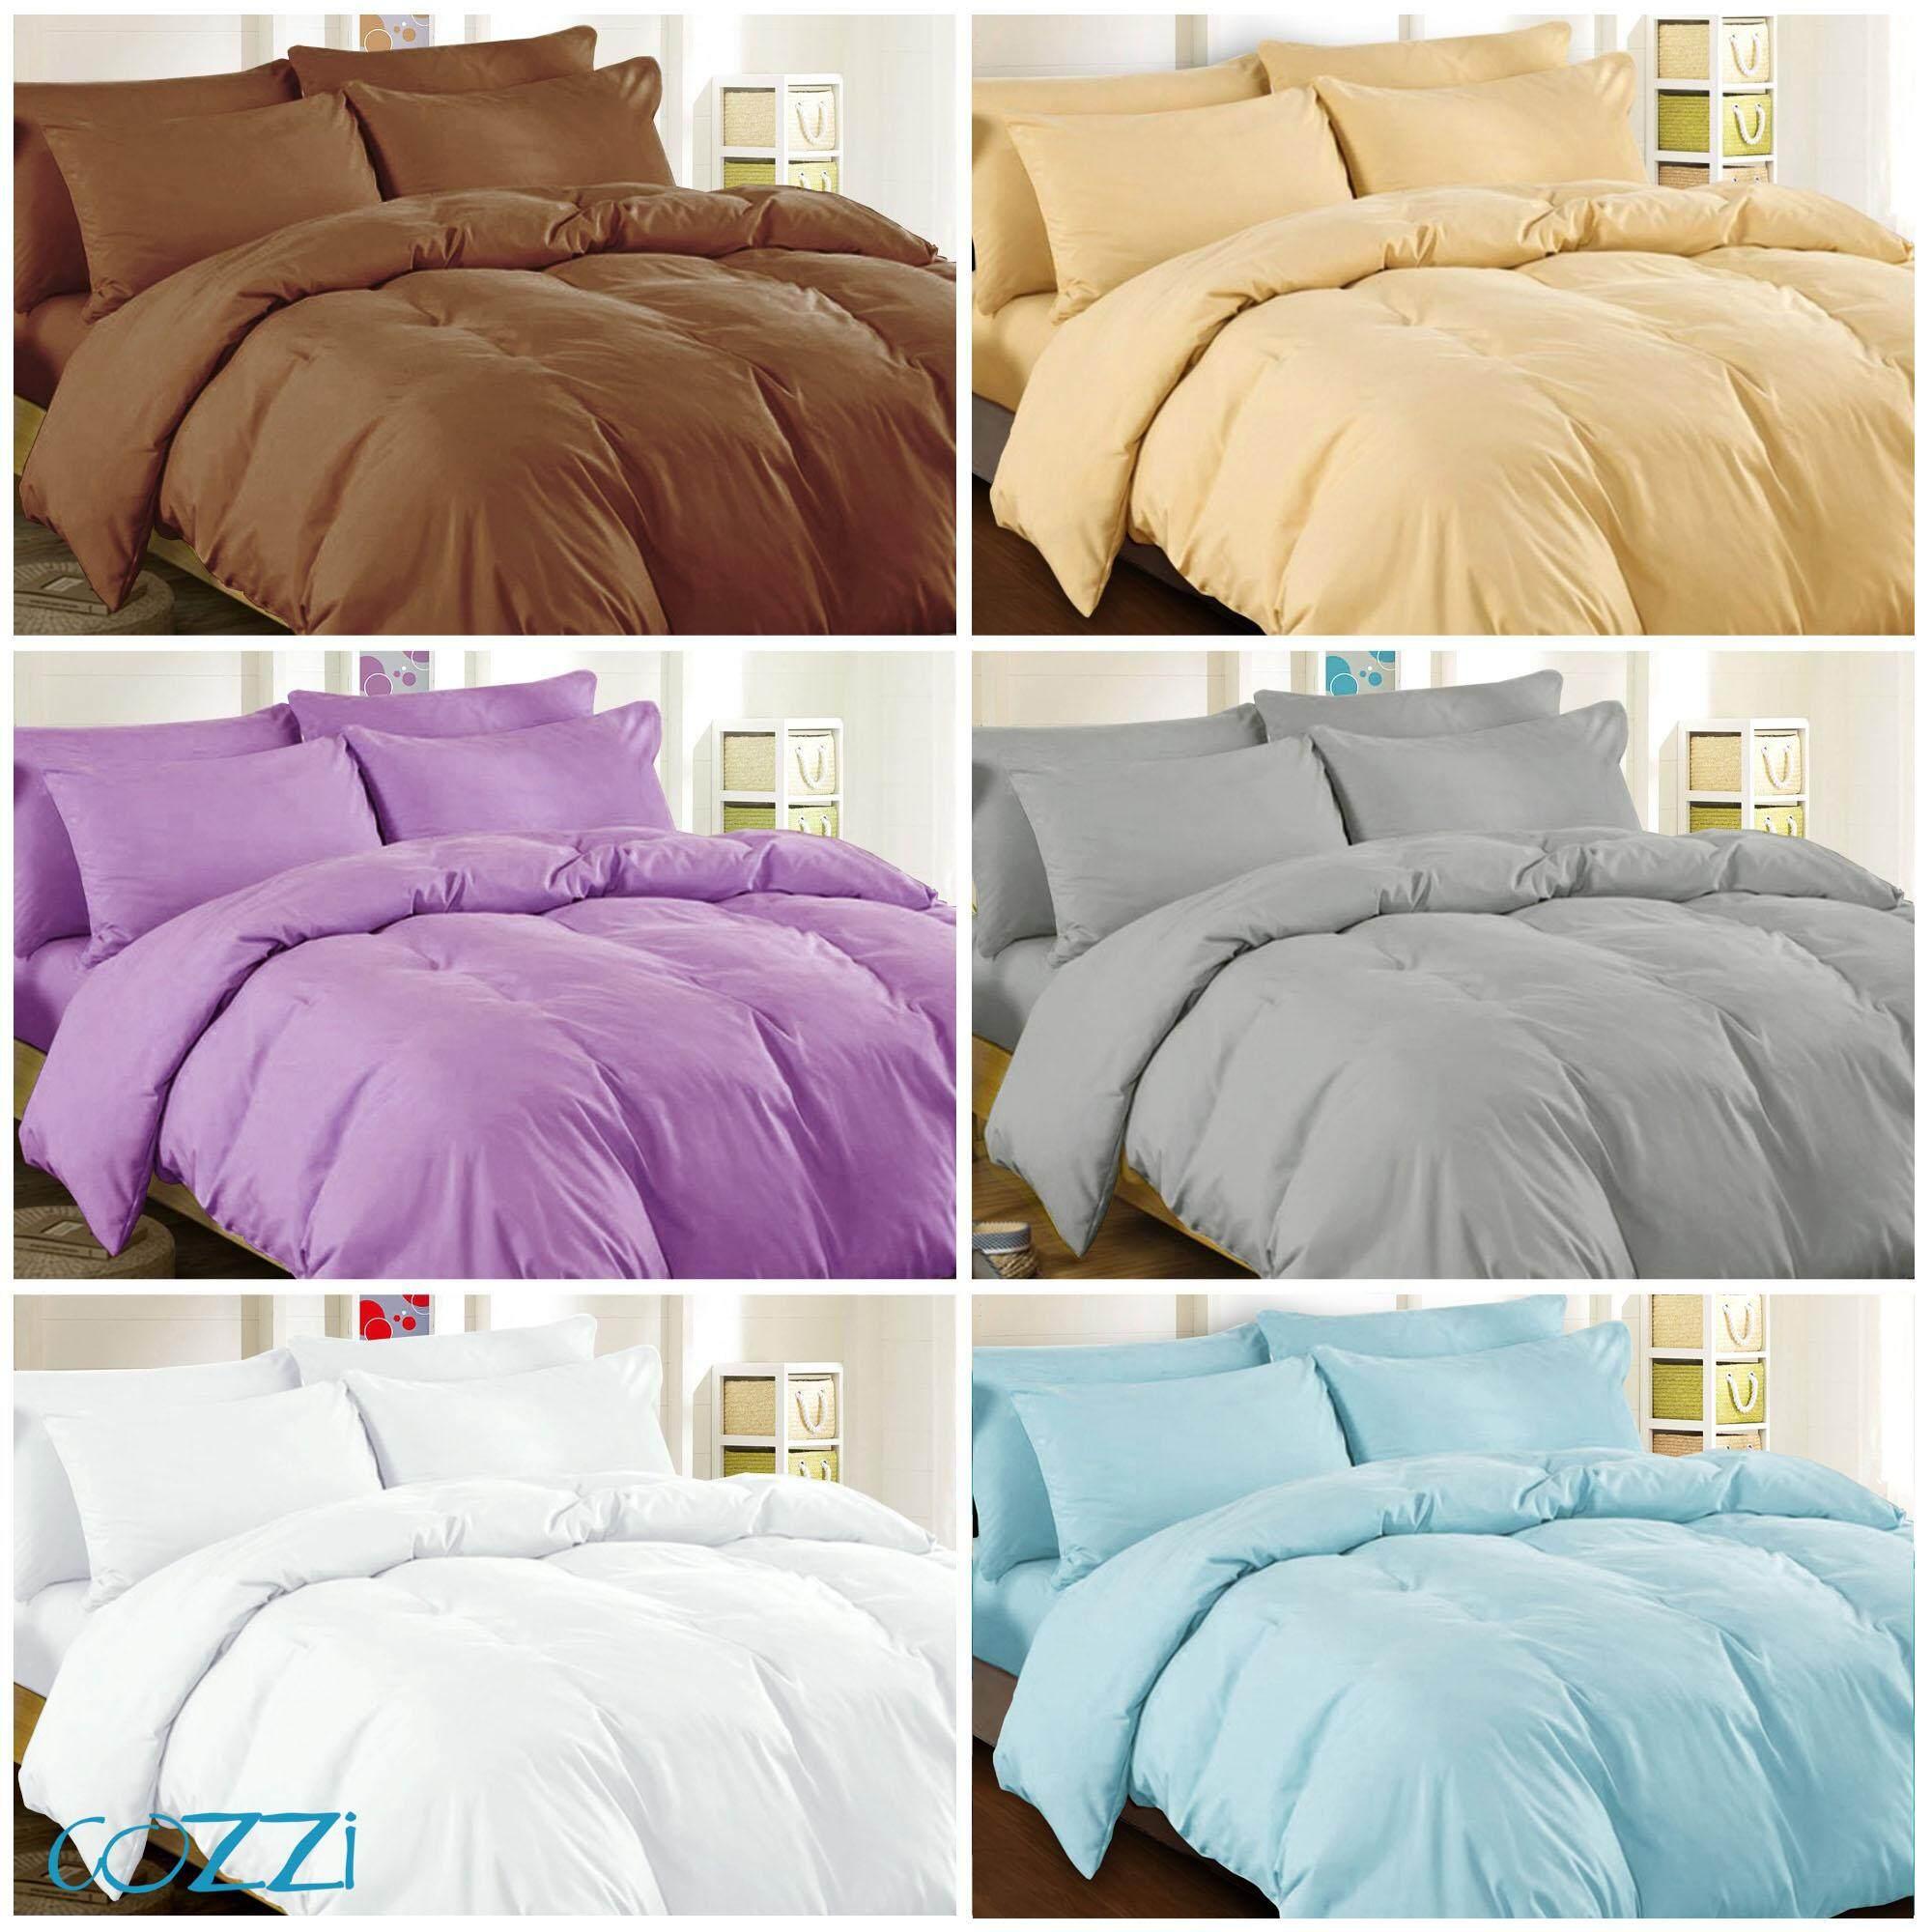 vb brown single product v set bed comforter ac mild quilt baby pack winter dohar cotton blankets blanket of for combo